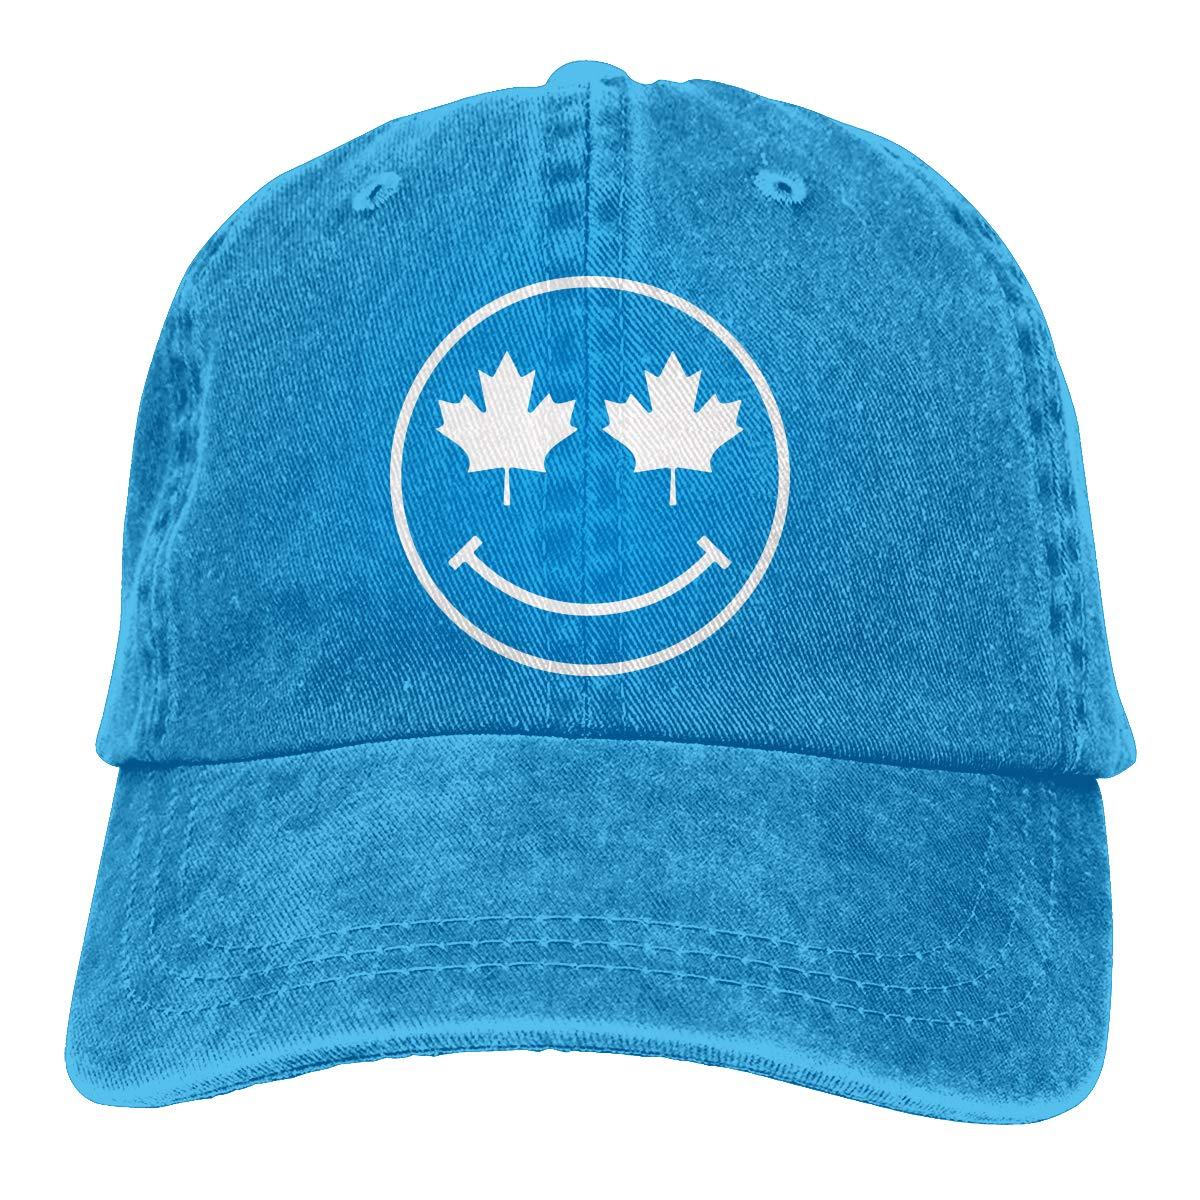 PMGM-C Canadian Smiley Unisex Personalize Jeans Casquette Adjustable Baseball Cap